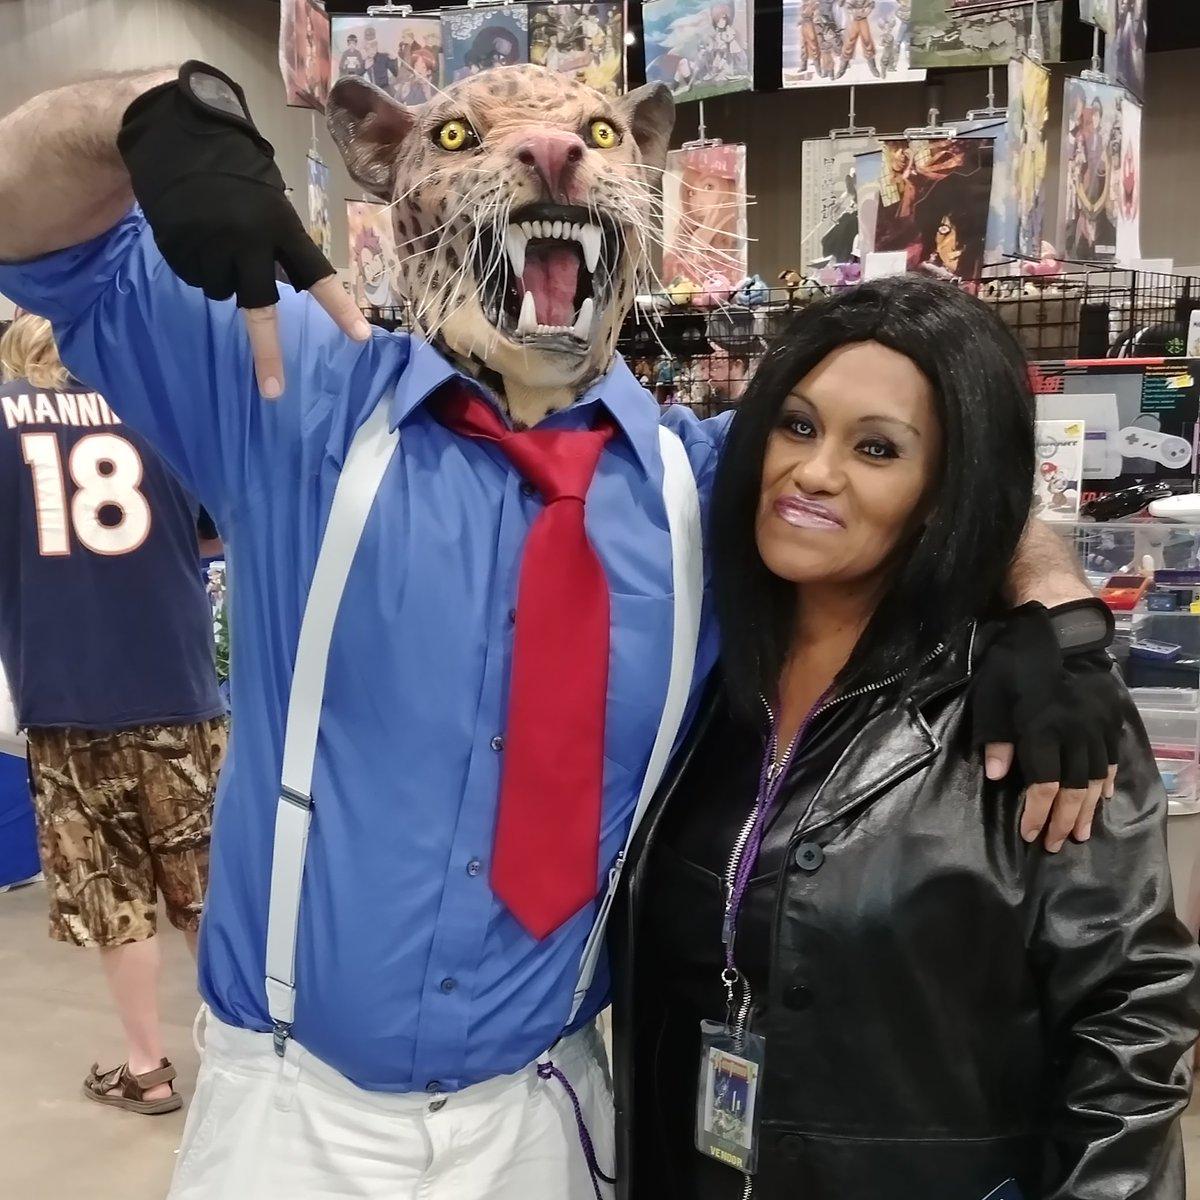 Priscilla Morales On Twitter Me With The King Tekken